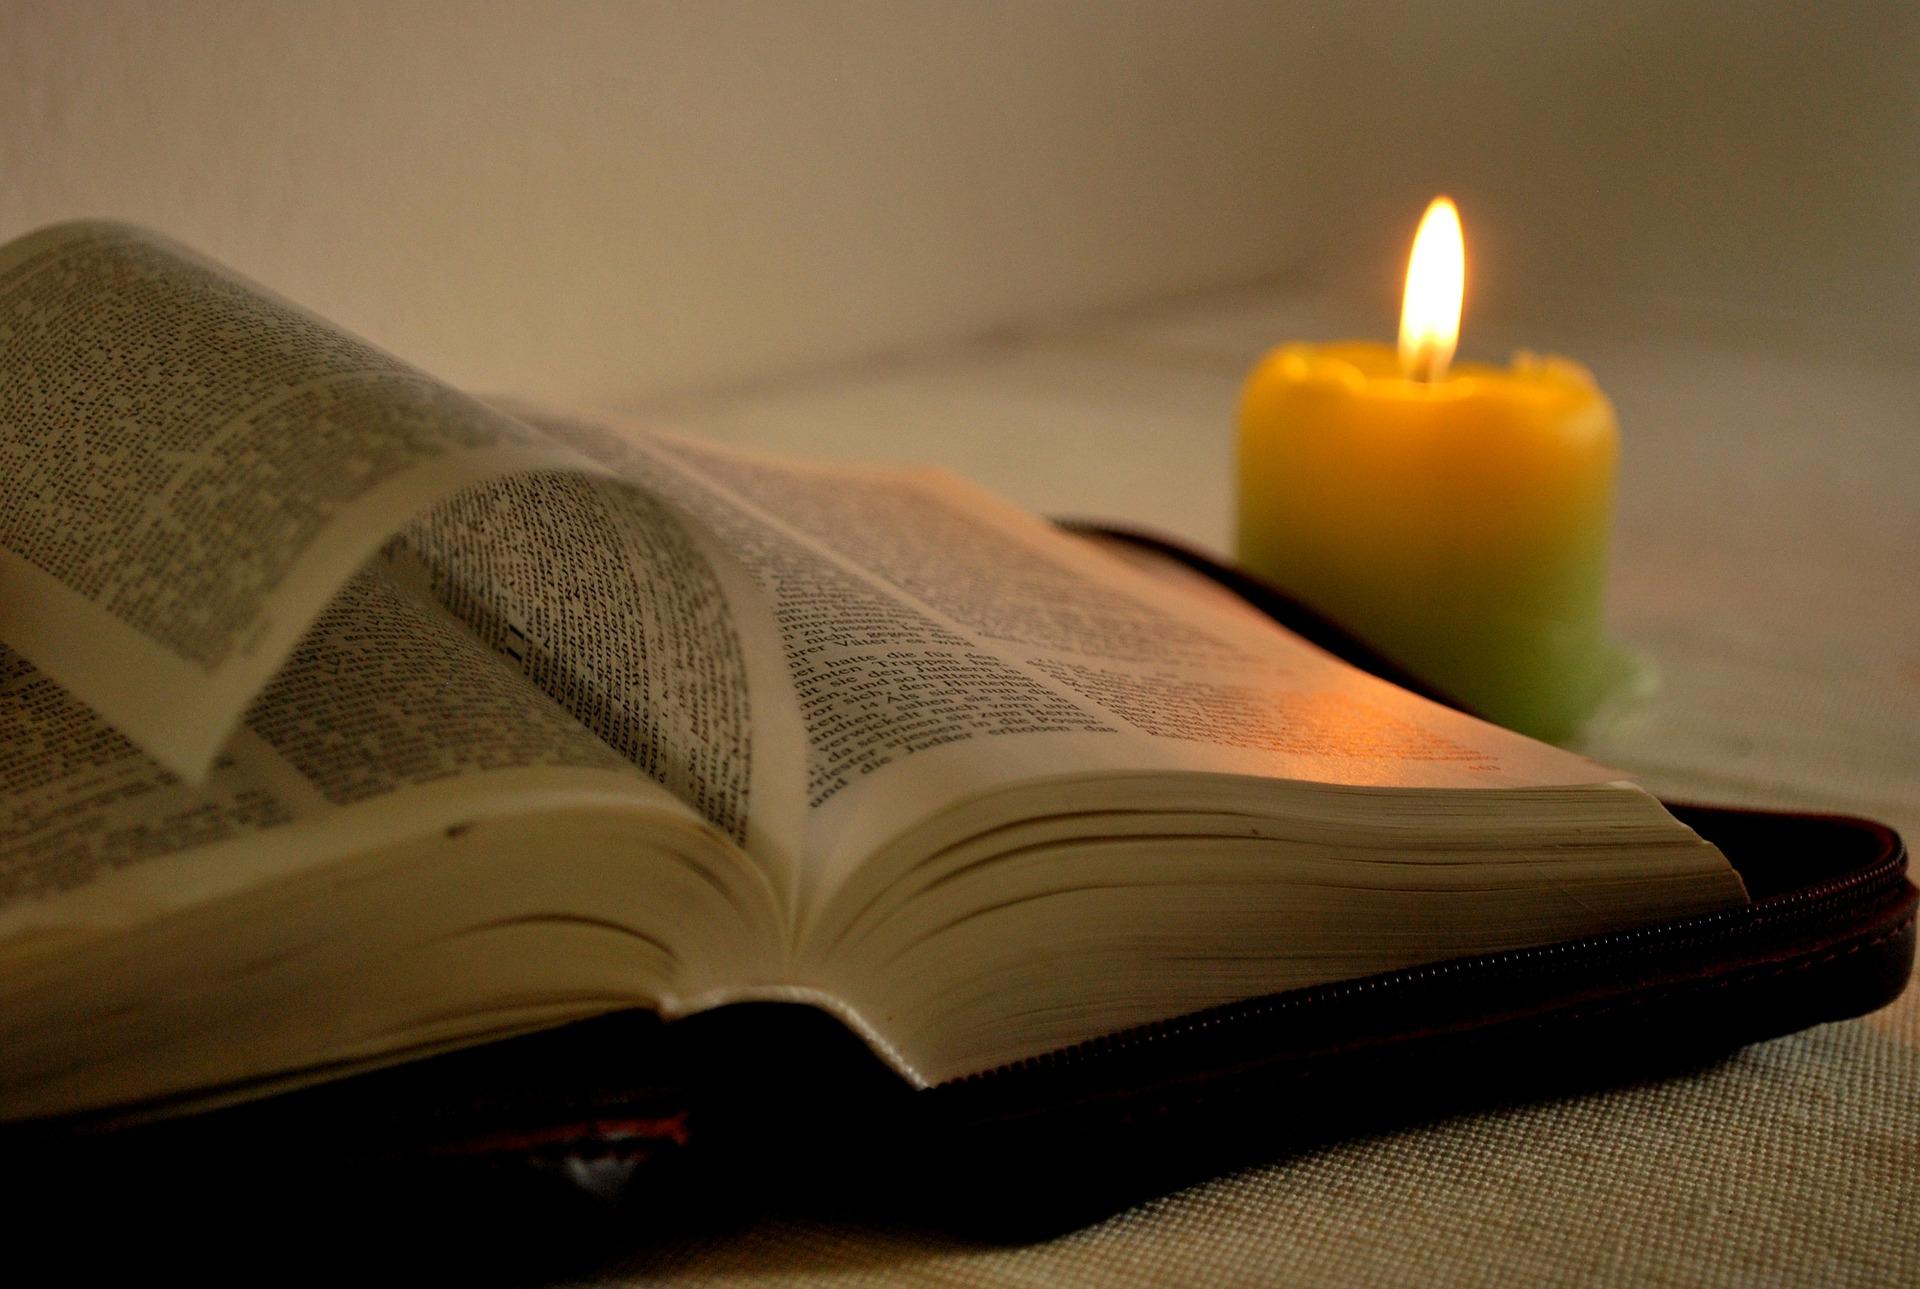 Effektives Bibelstudium Zusammenfassung – Exegese & Hermeneutik der Bibel